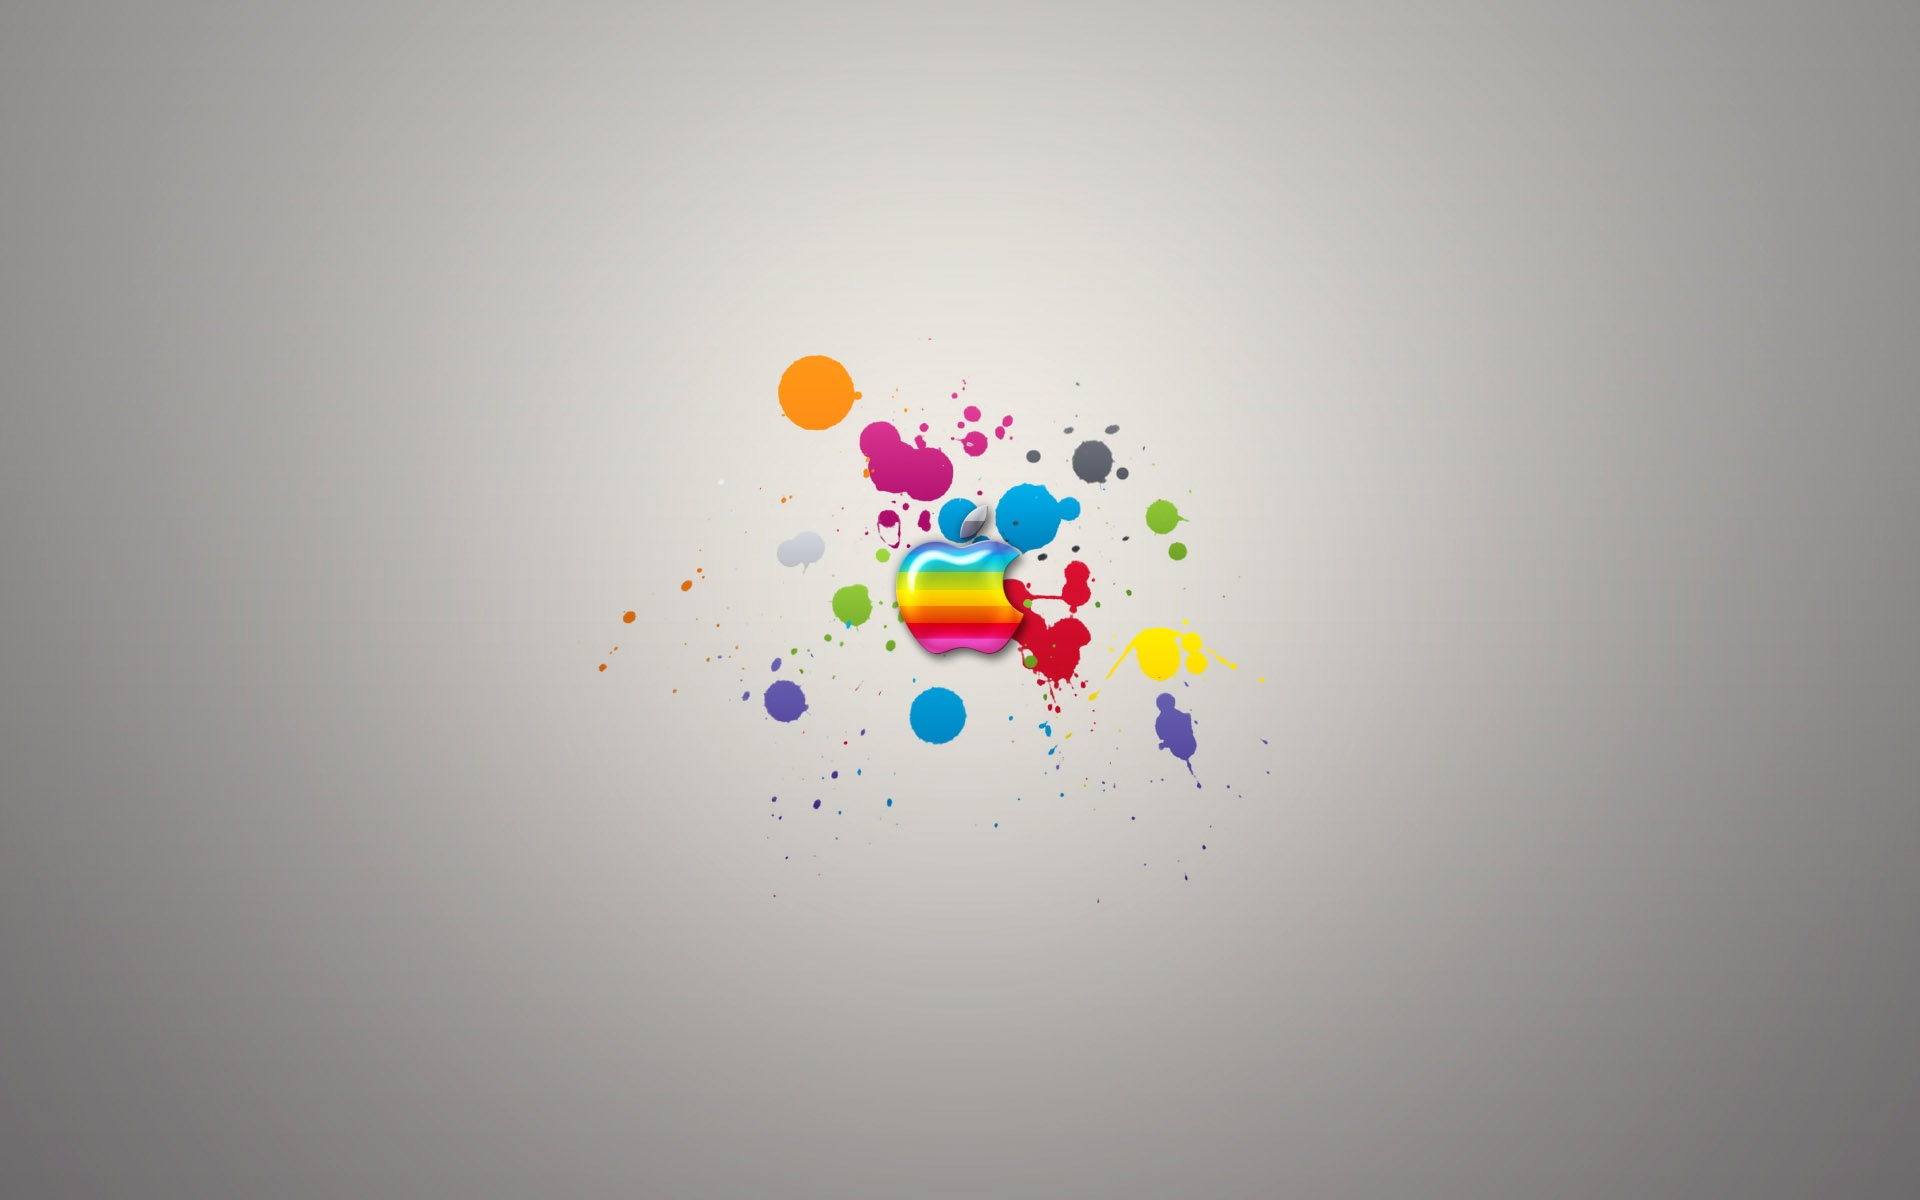 Download Wallpaper x Apple Mac Colorful Rainbow Paint